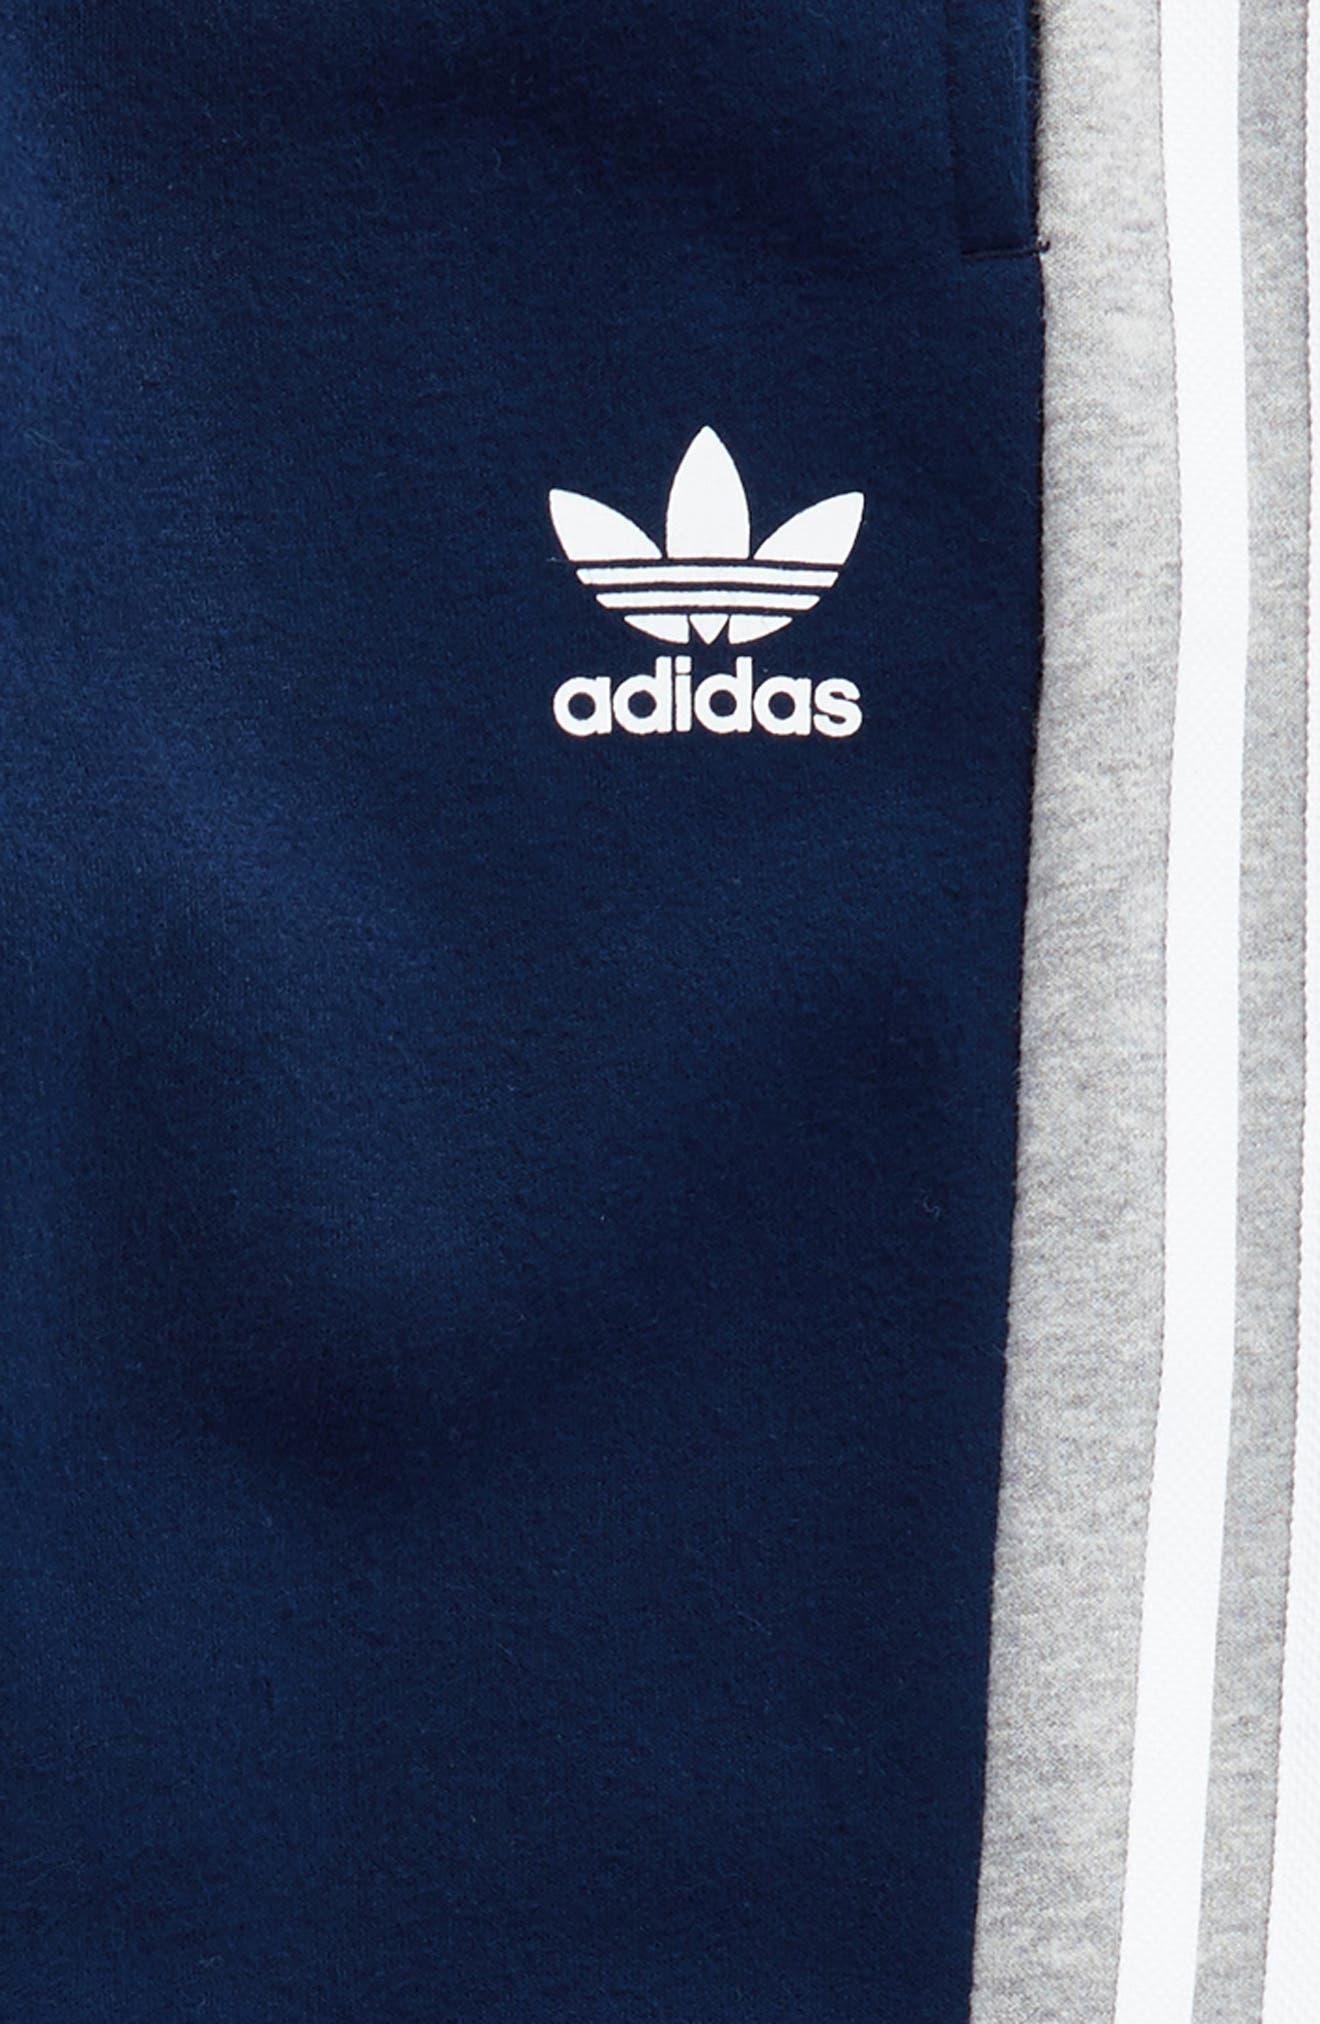 adidas FL Jogger Pants,                             Alternate thumbnail 3, color,                             415